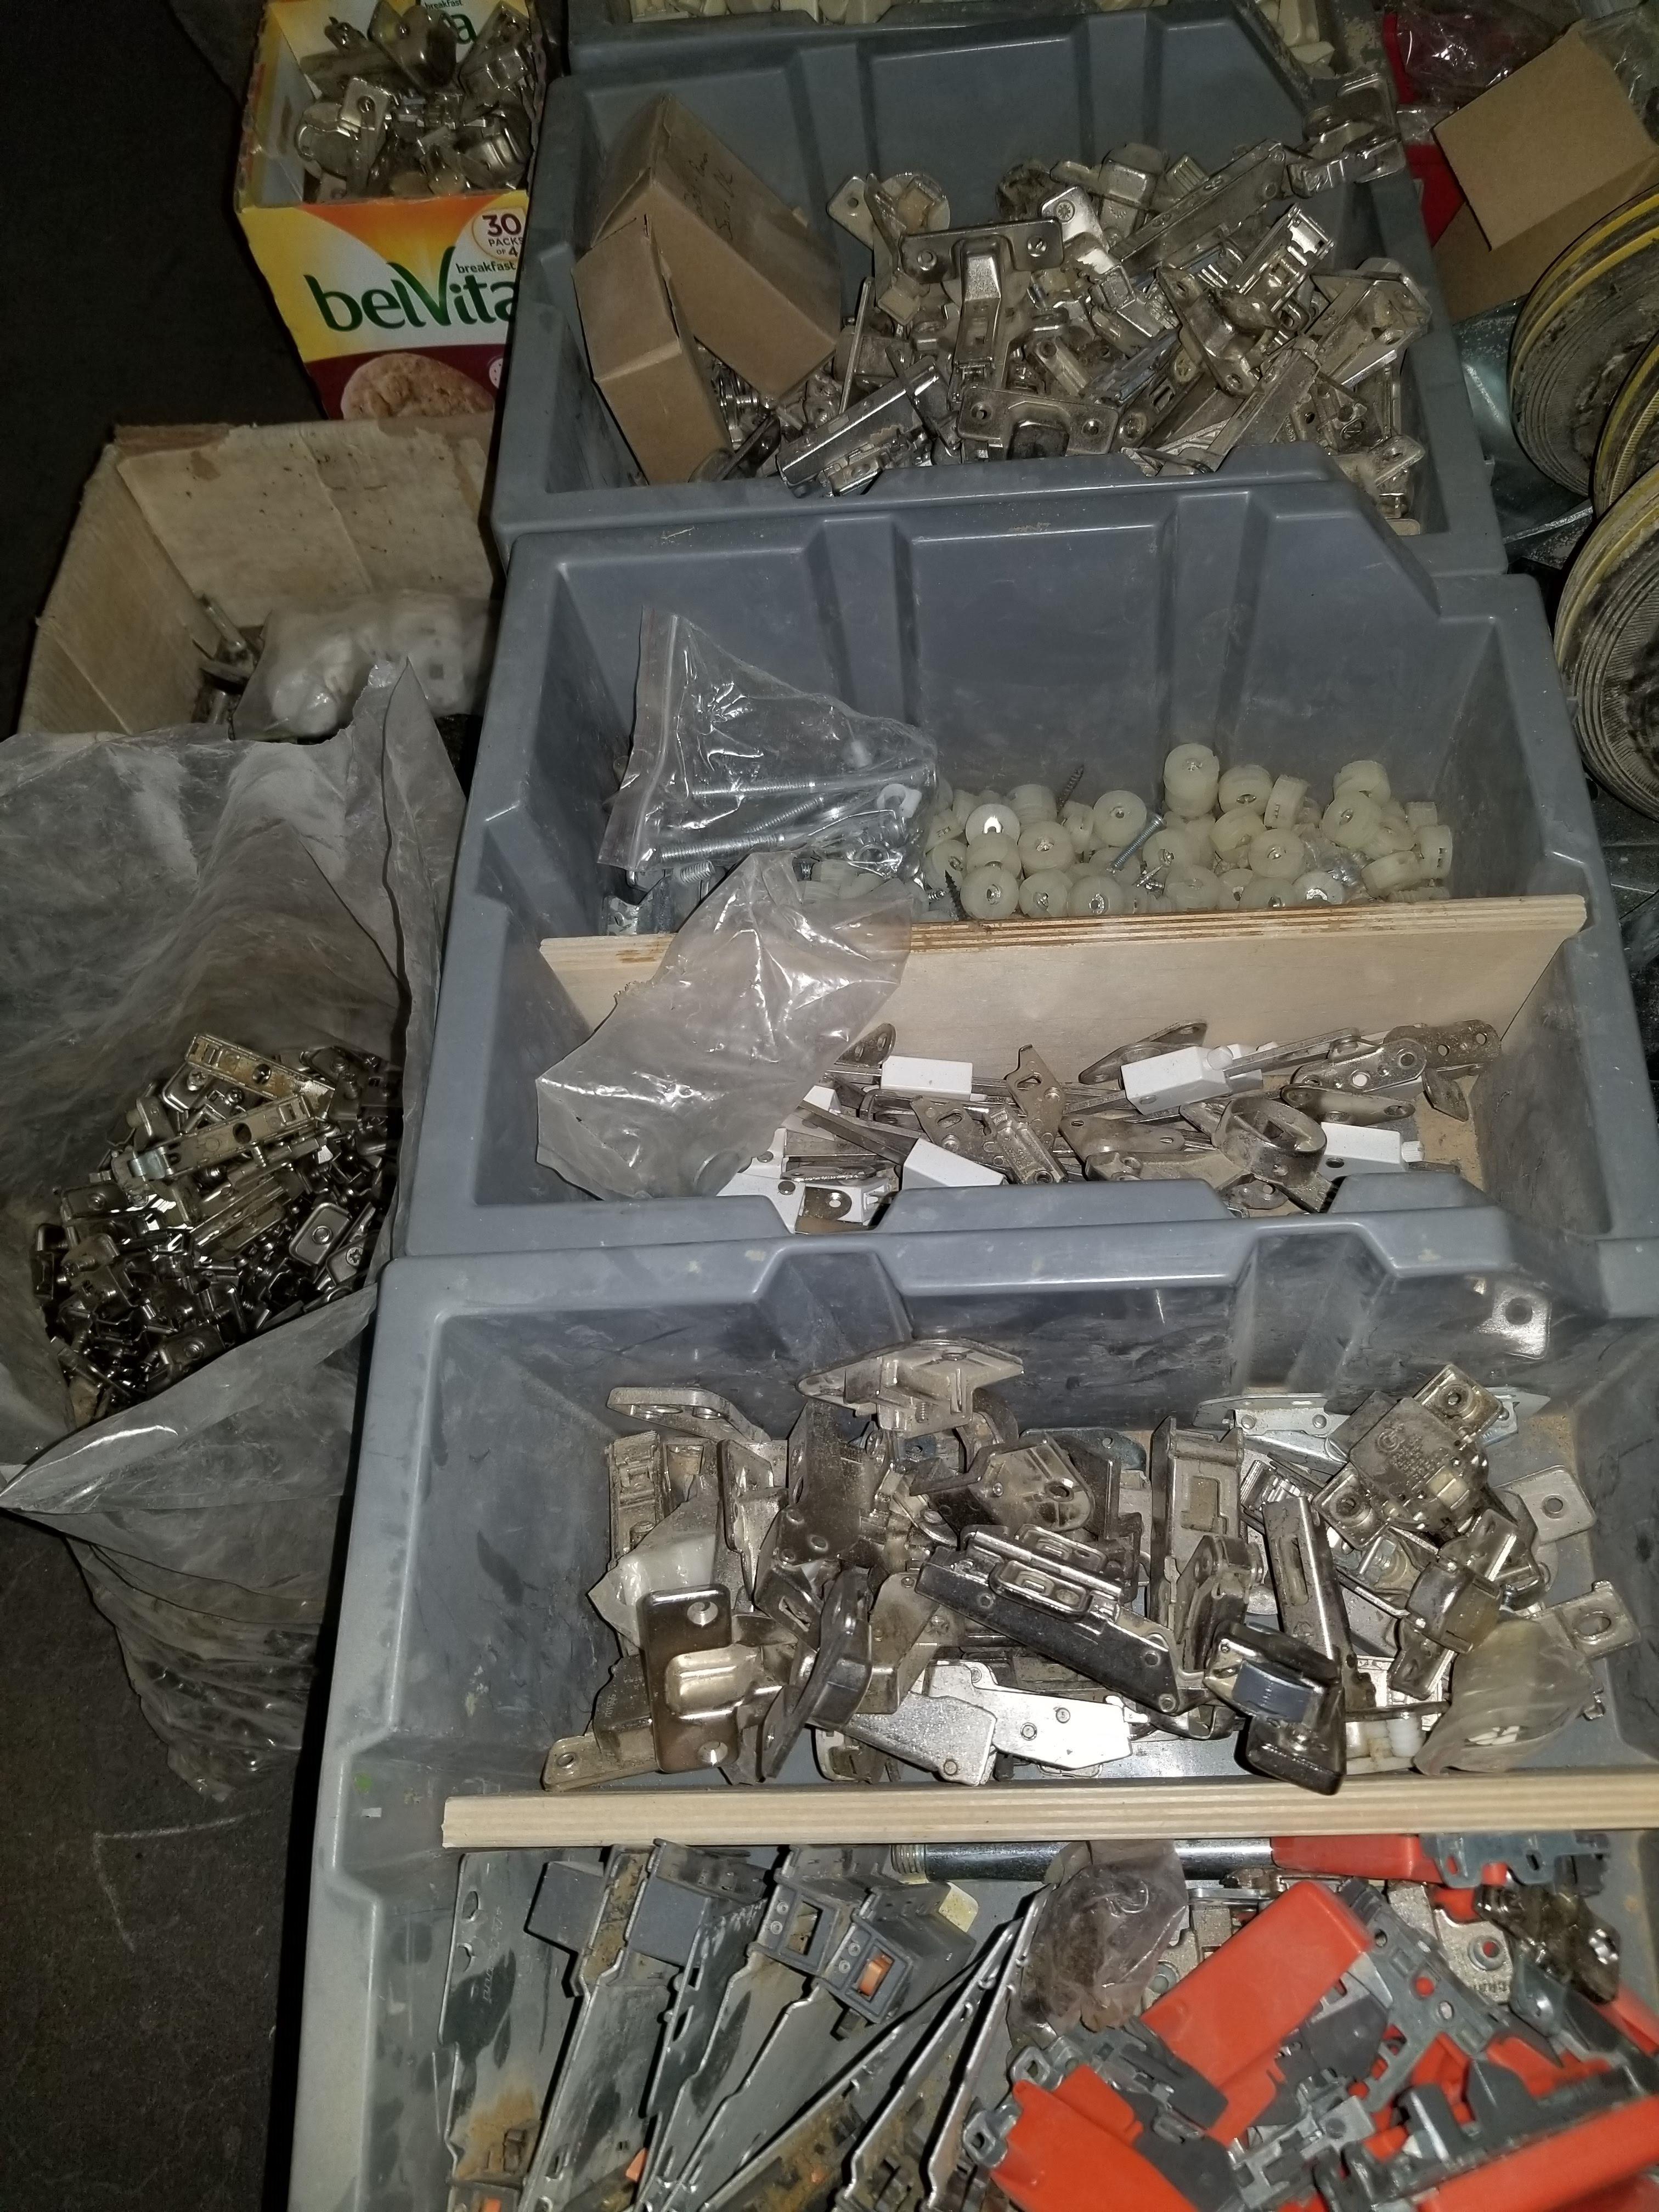 Pallet of Misc. Hardware, Hinges, Screws, Spacers, caster wheels, & More - Image 2 of 6